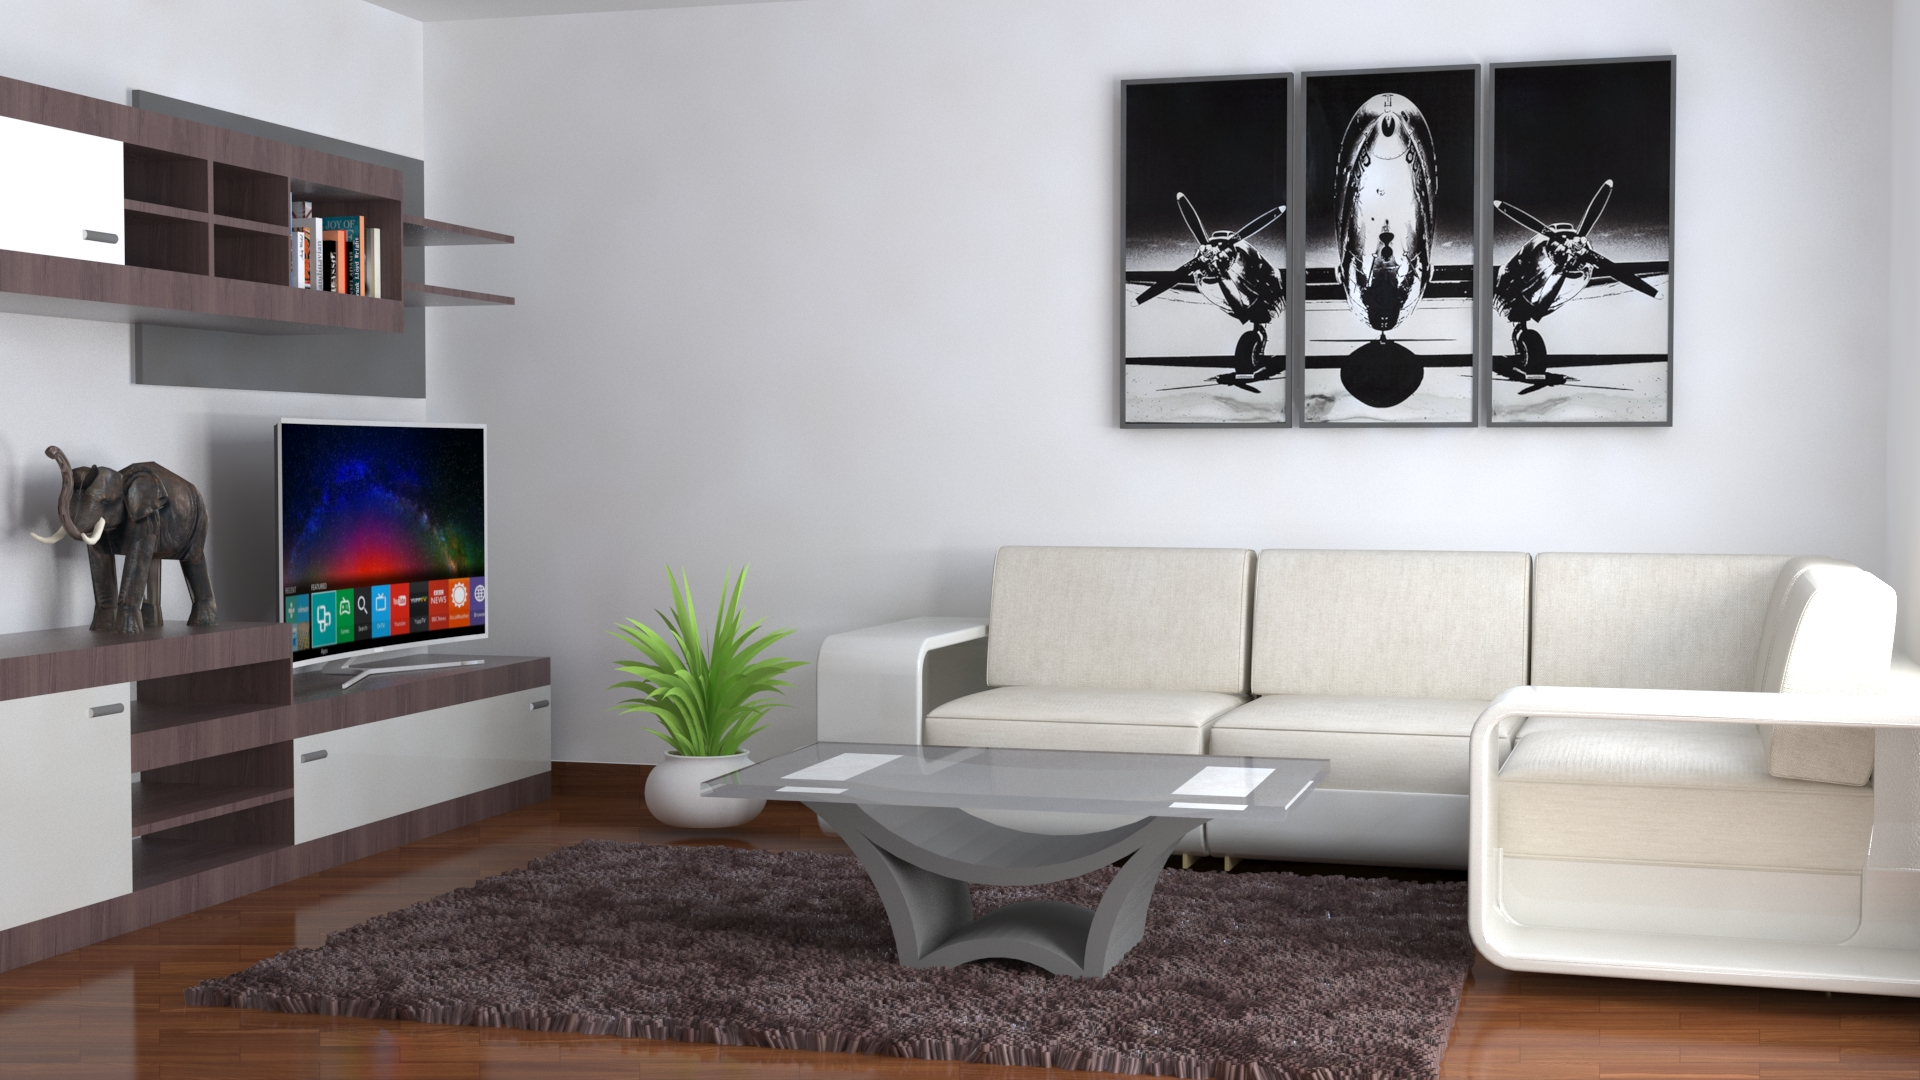 Interior Design 3d Model 264676